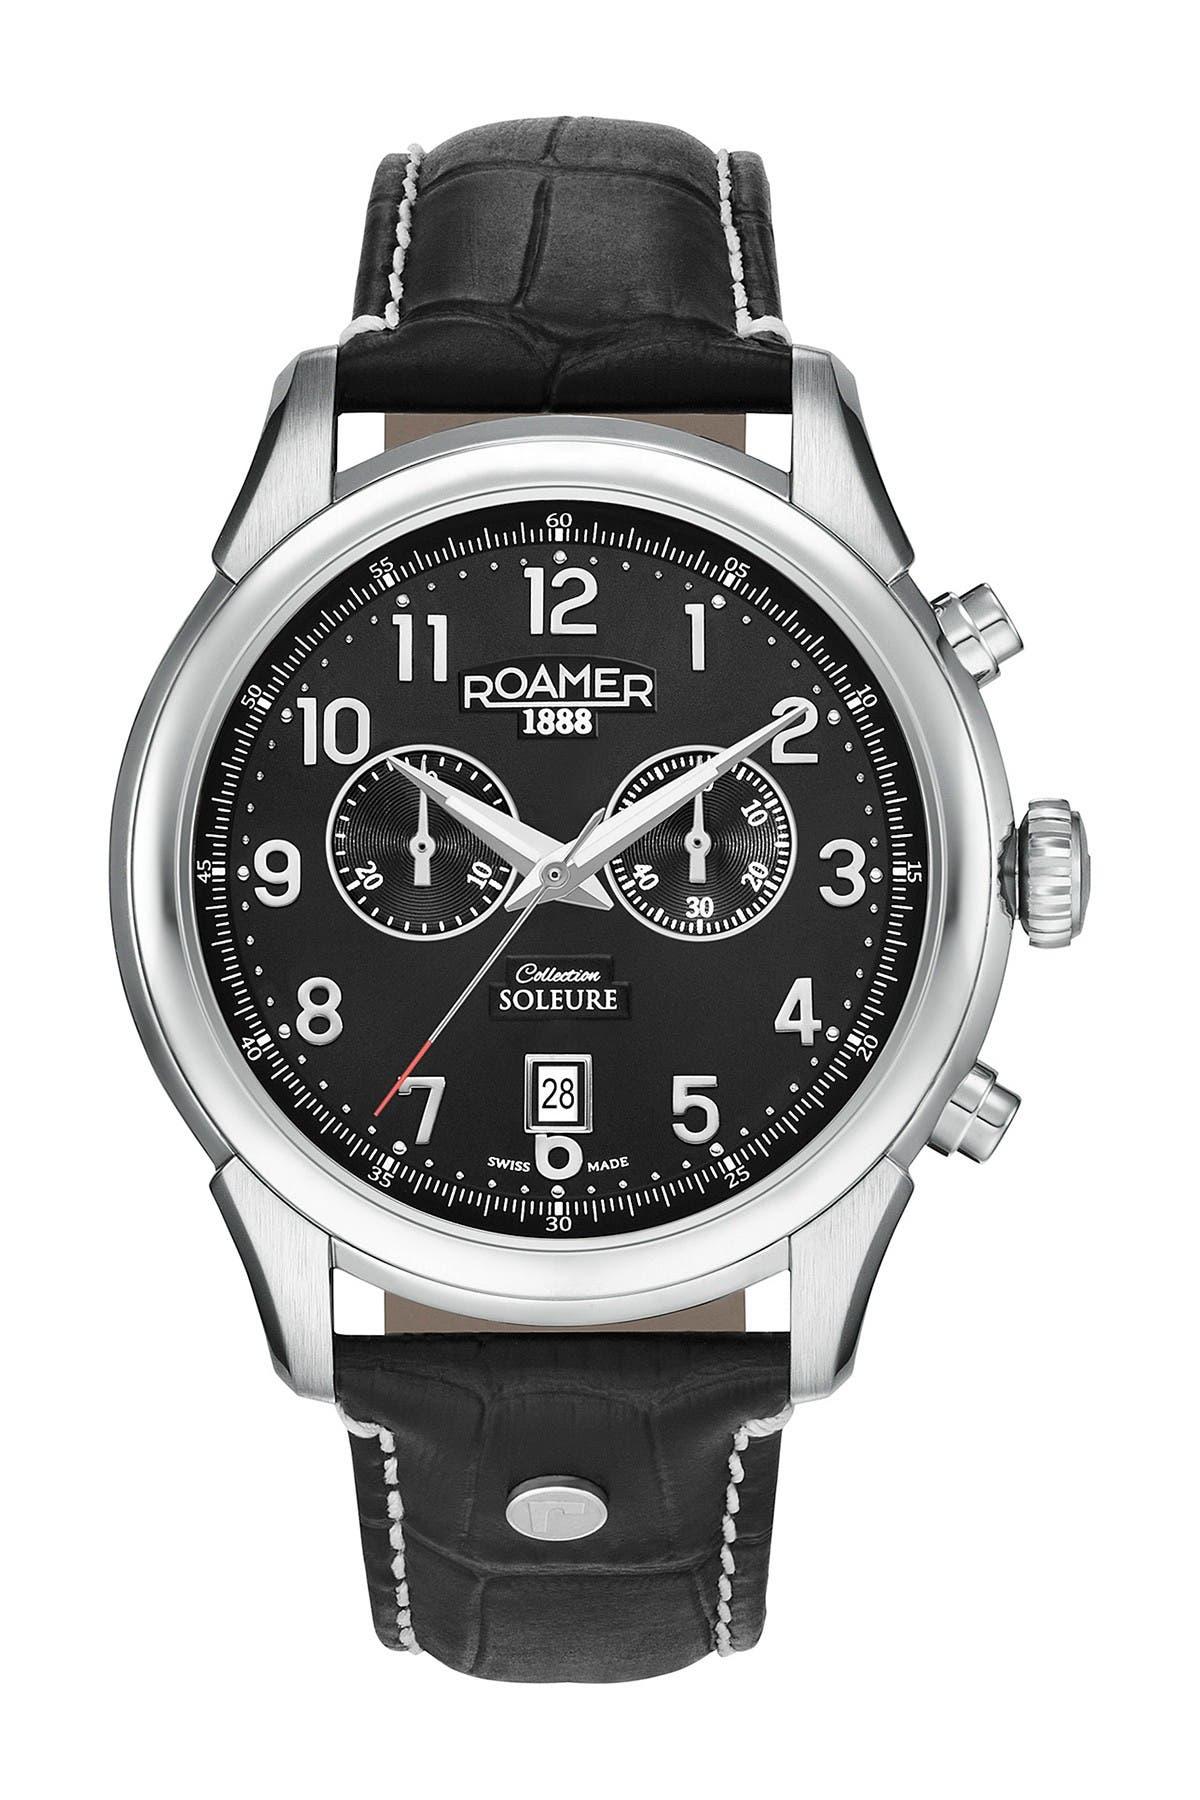 Image of Roamer Men's Soleure Chronograph Date Watch